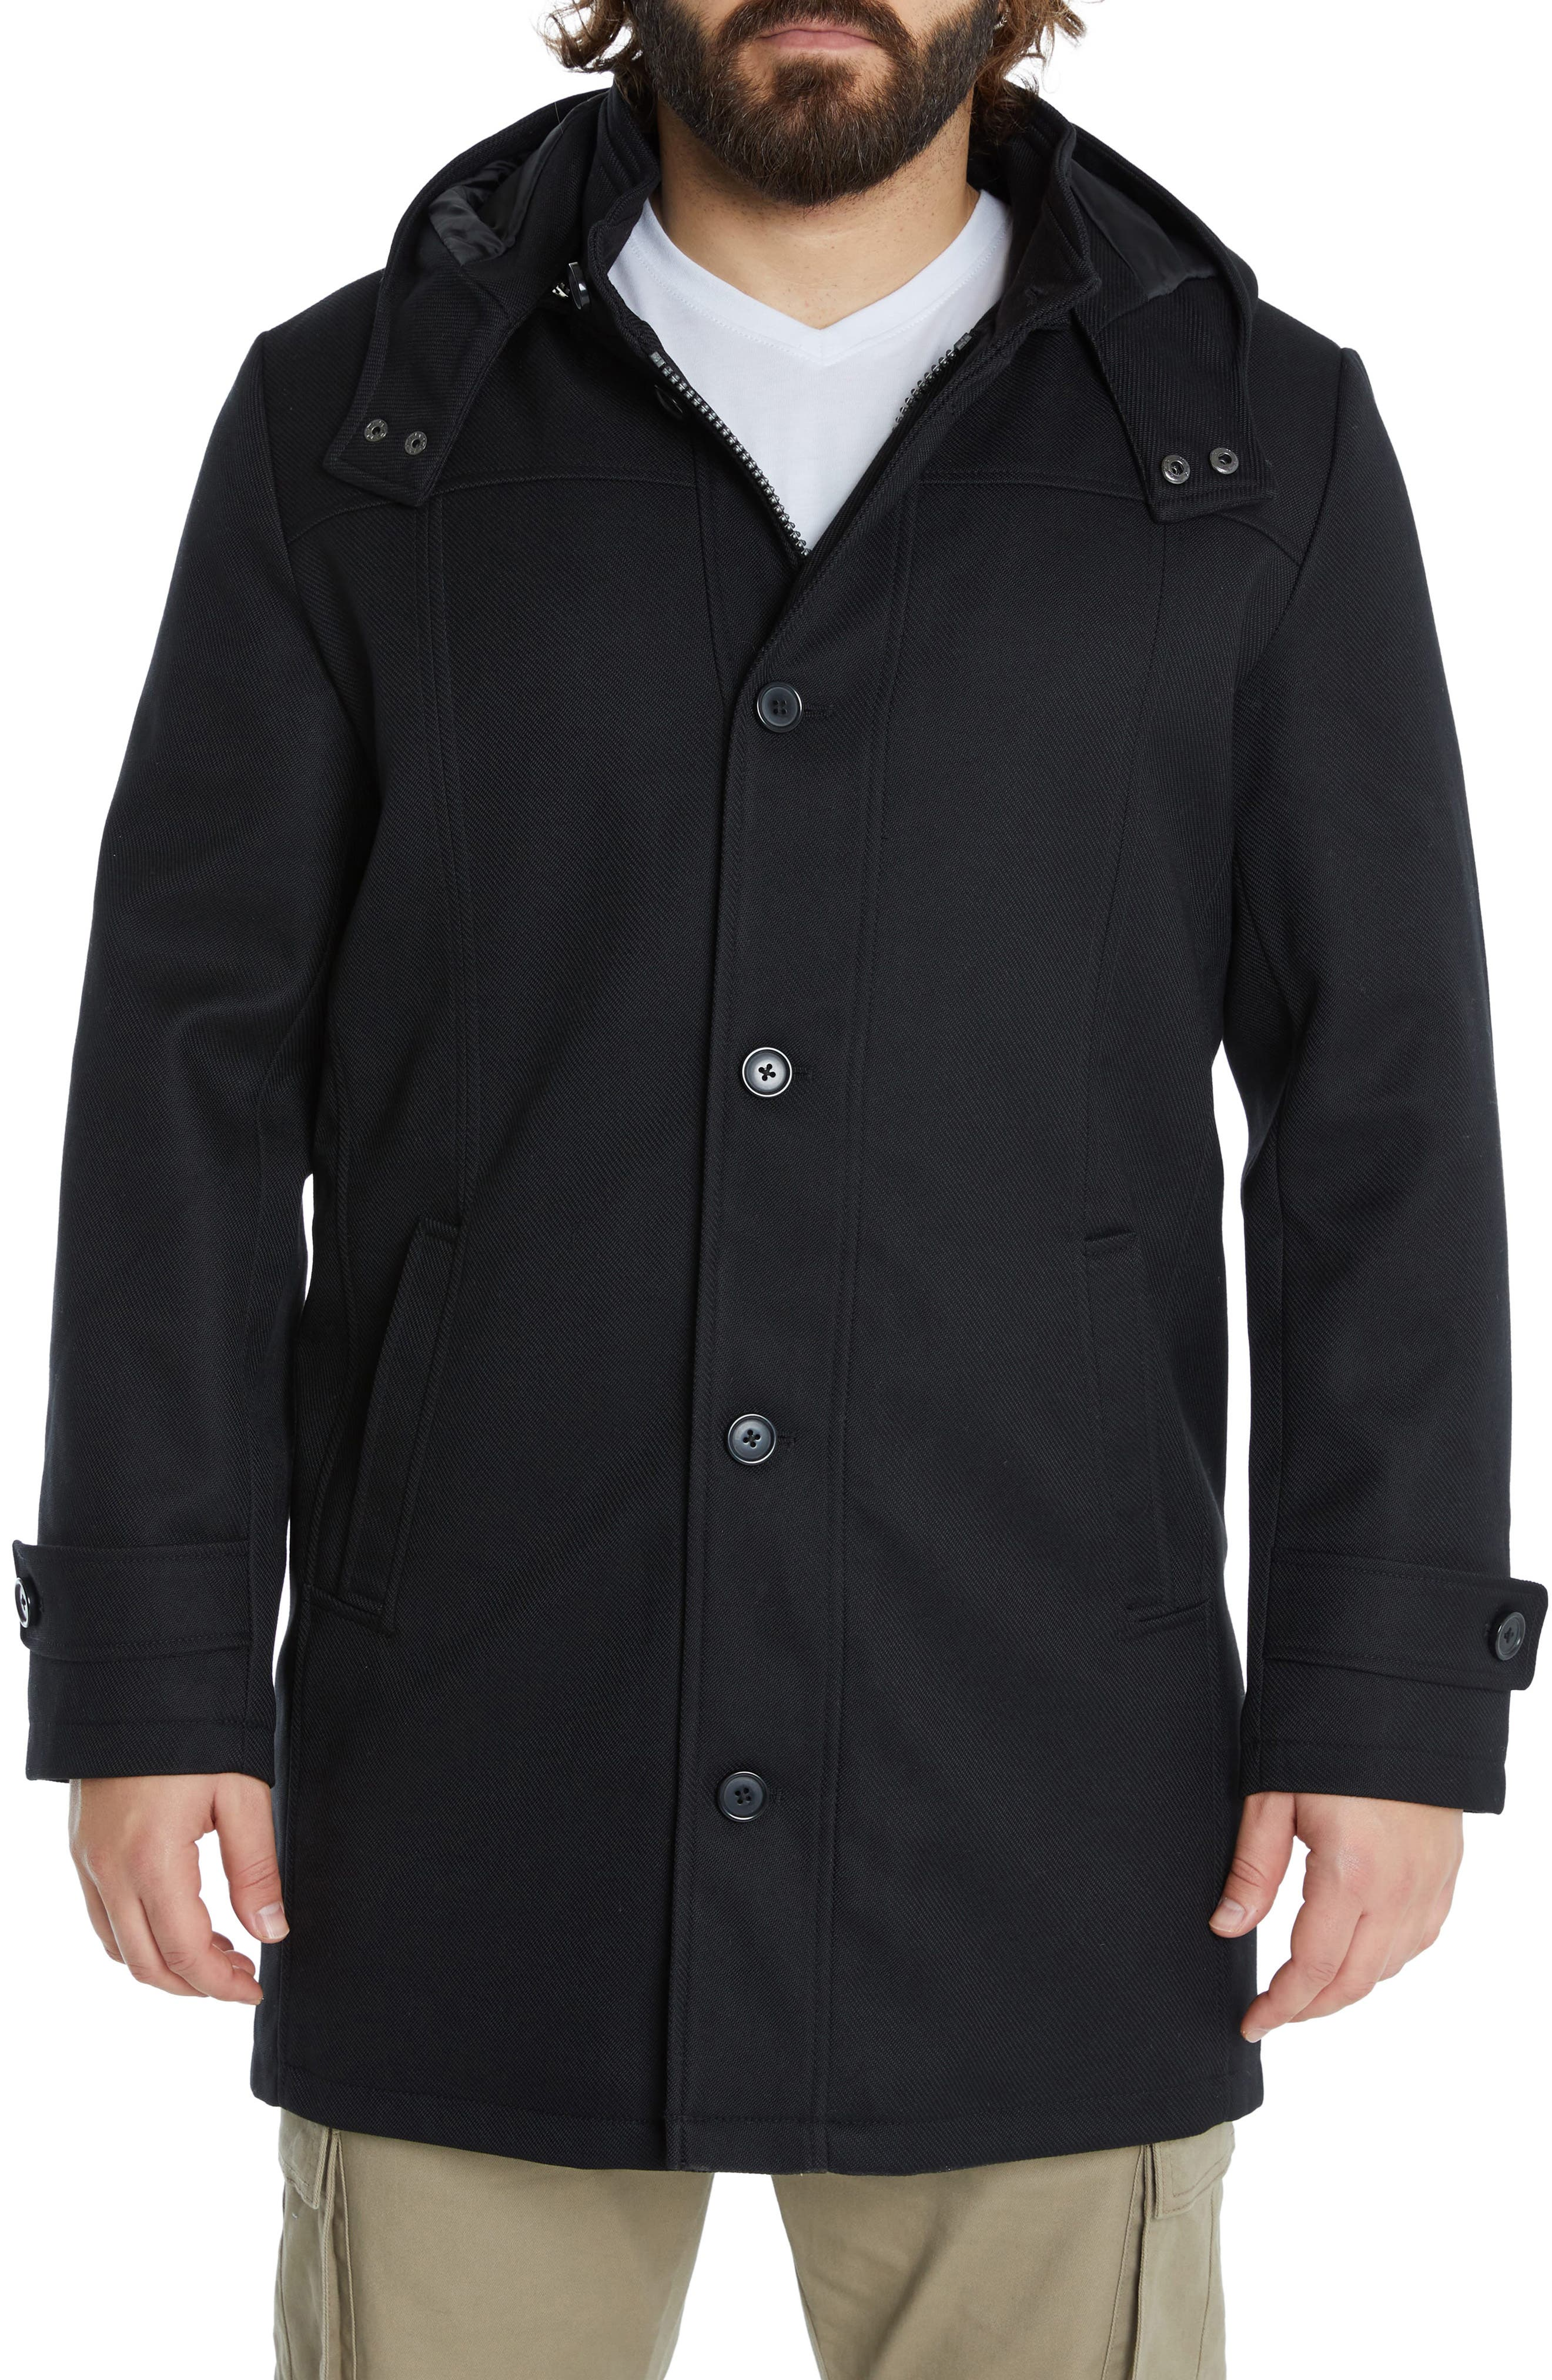 Wales Hooded Coat